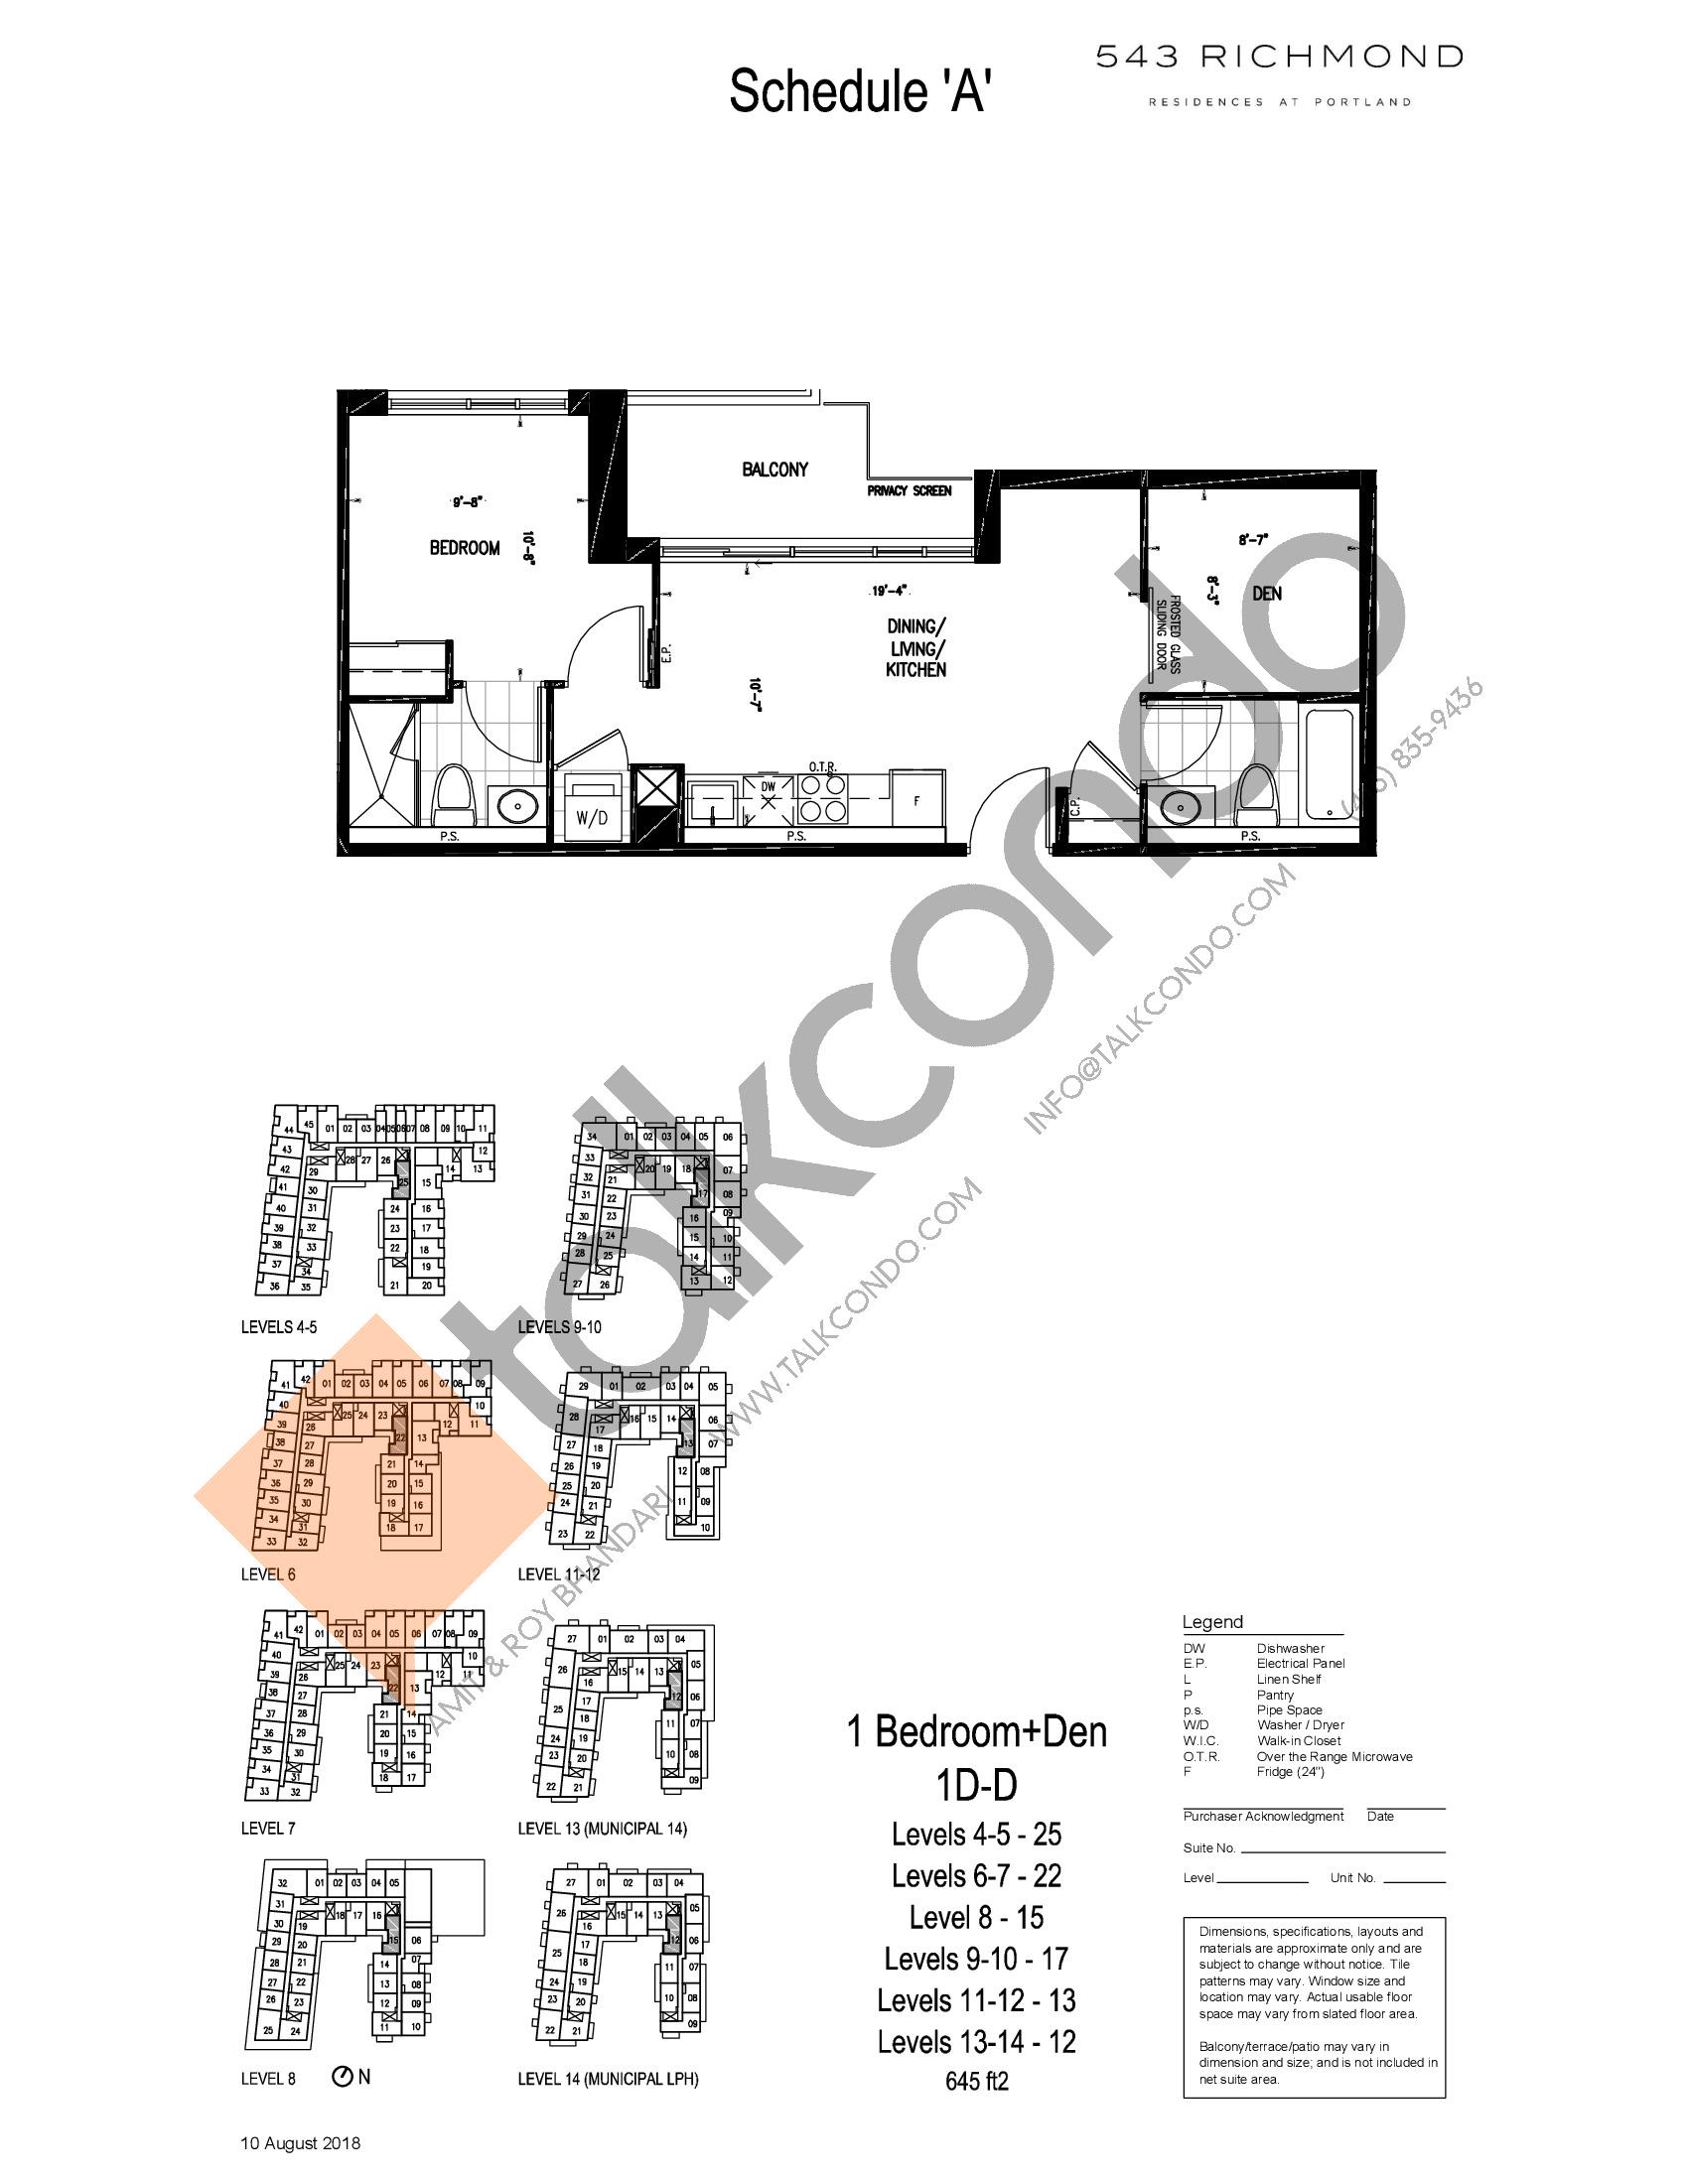 1D-D Floor Plan at 543 Richmond St Condos - 645 sq.ft